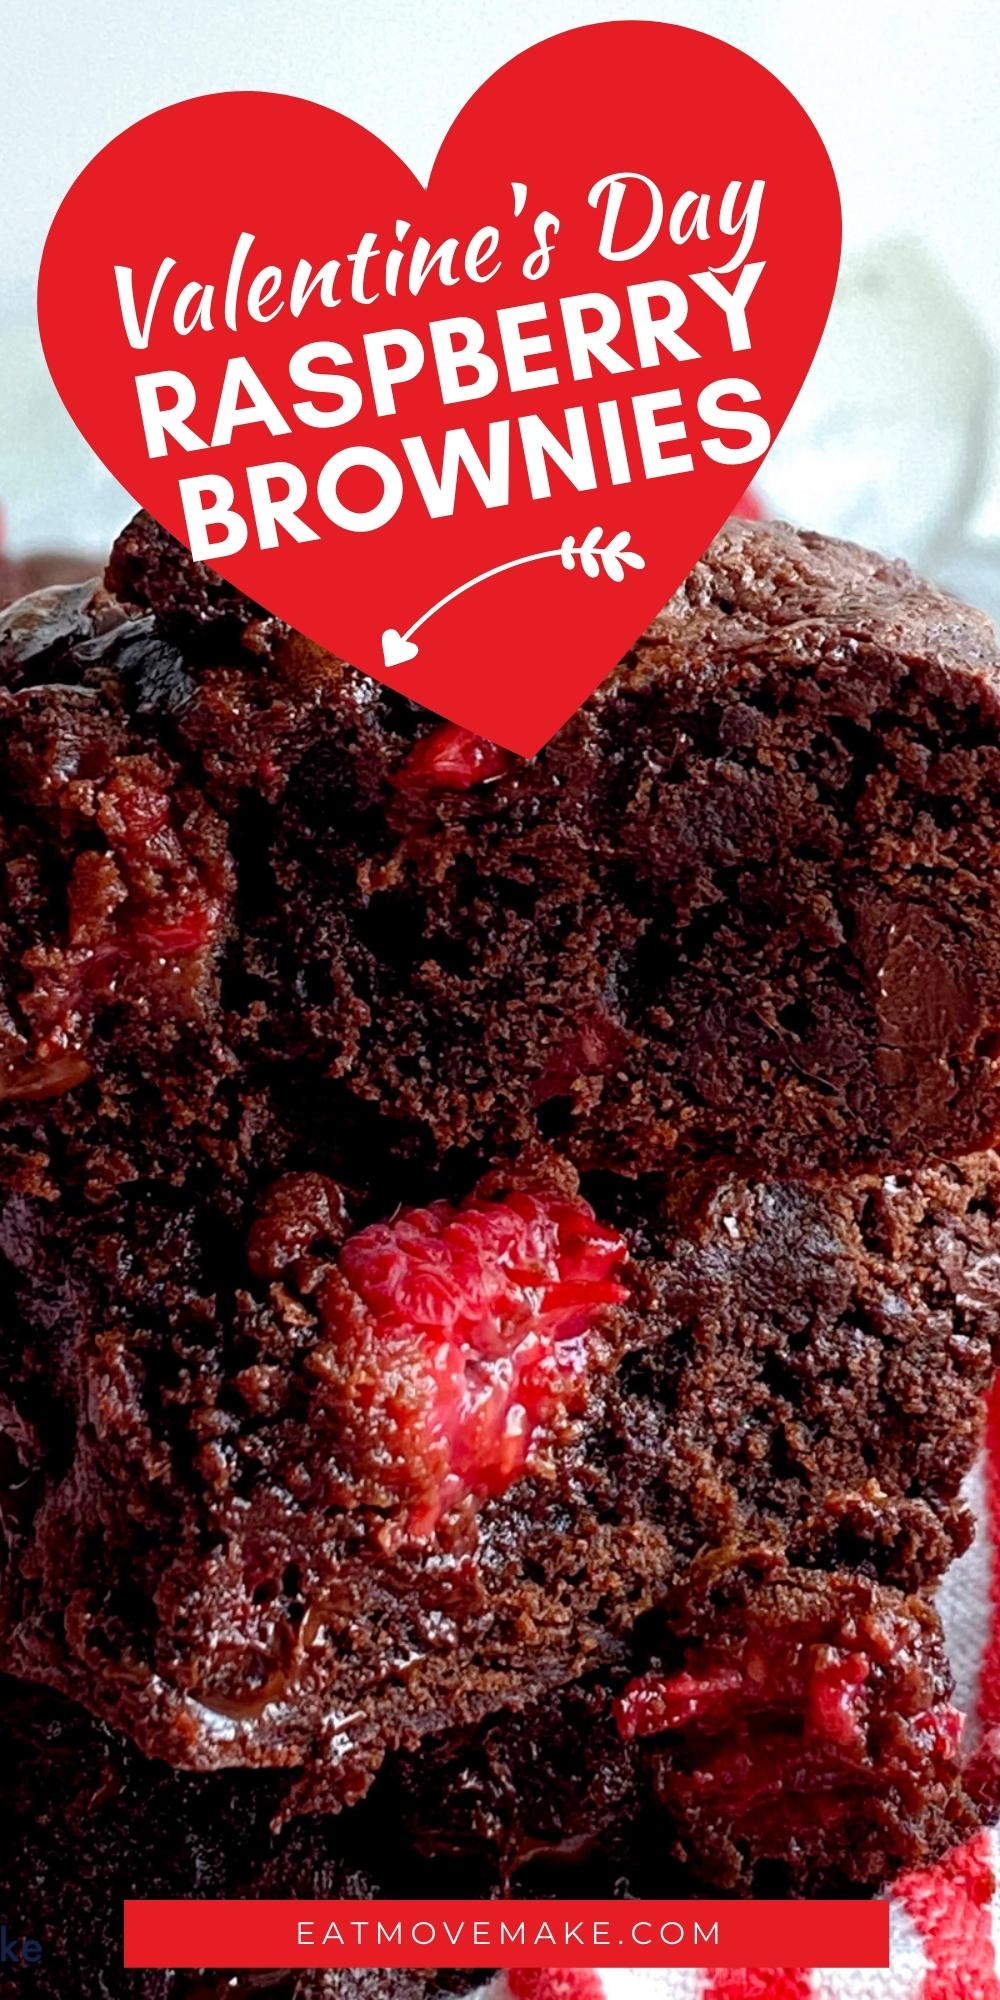 Valentine's Day Raspberry Brownies